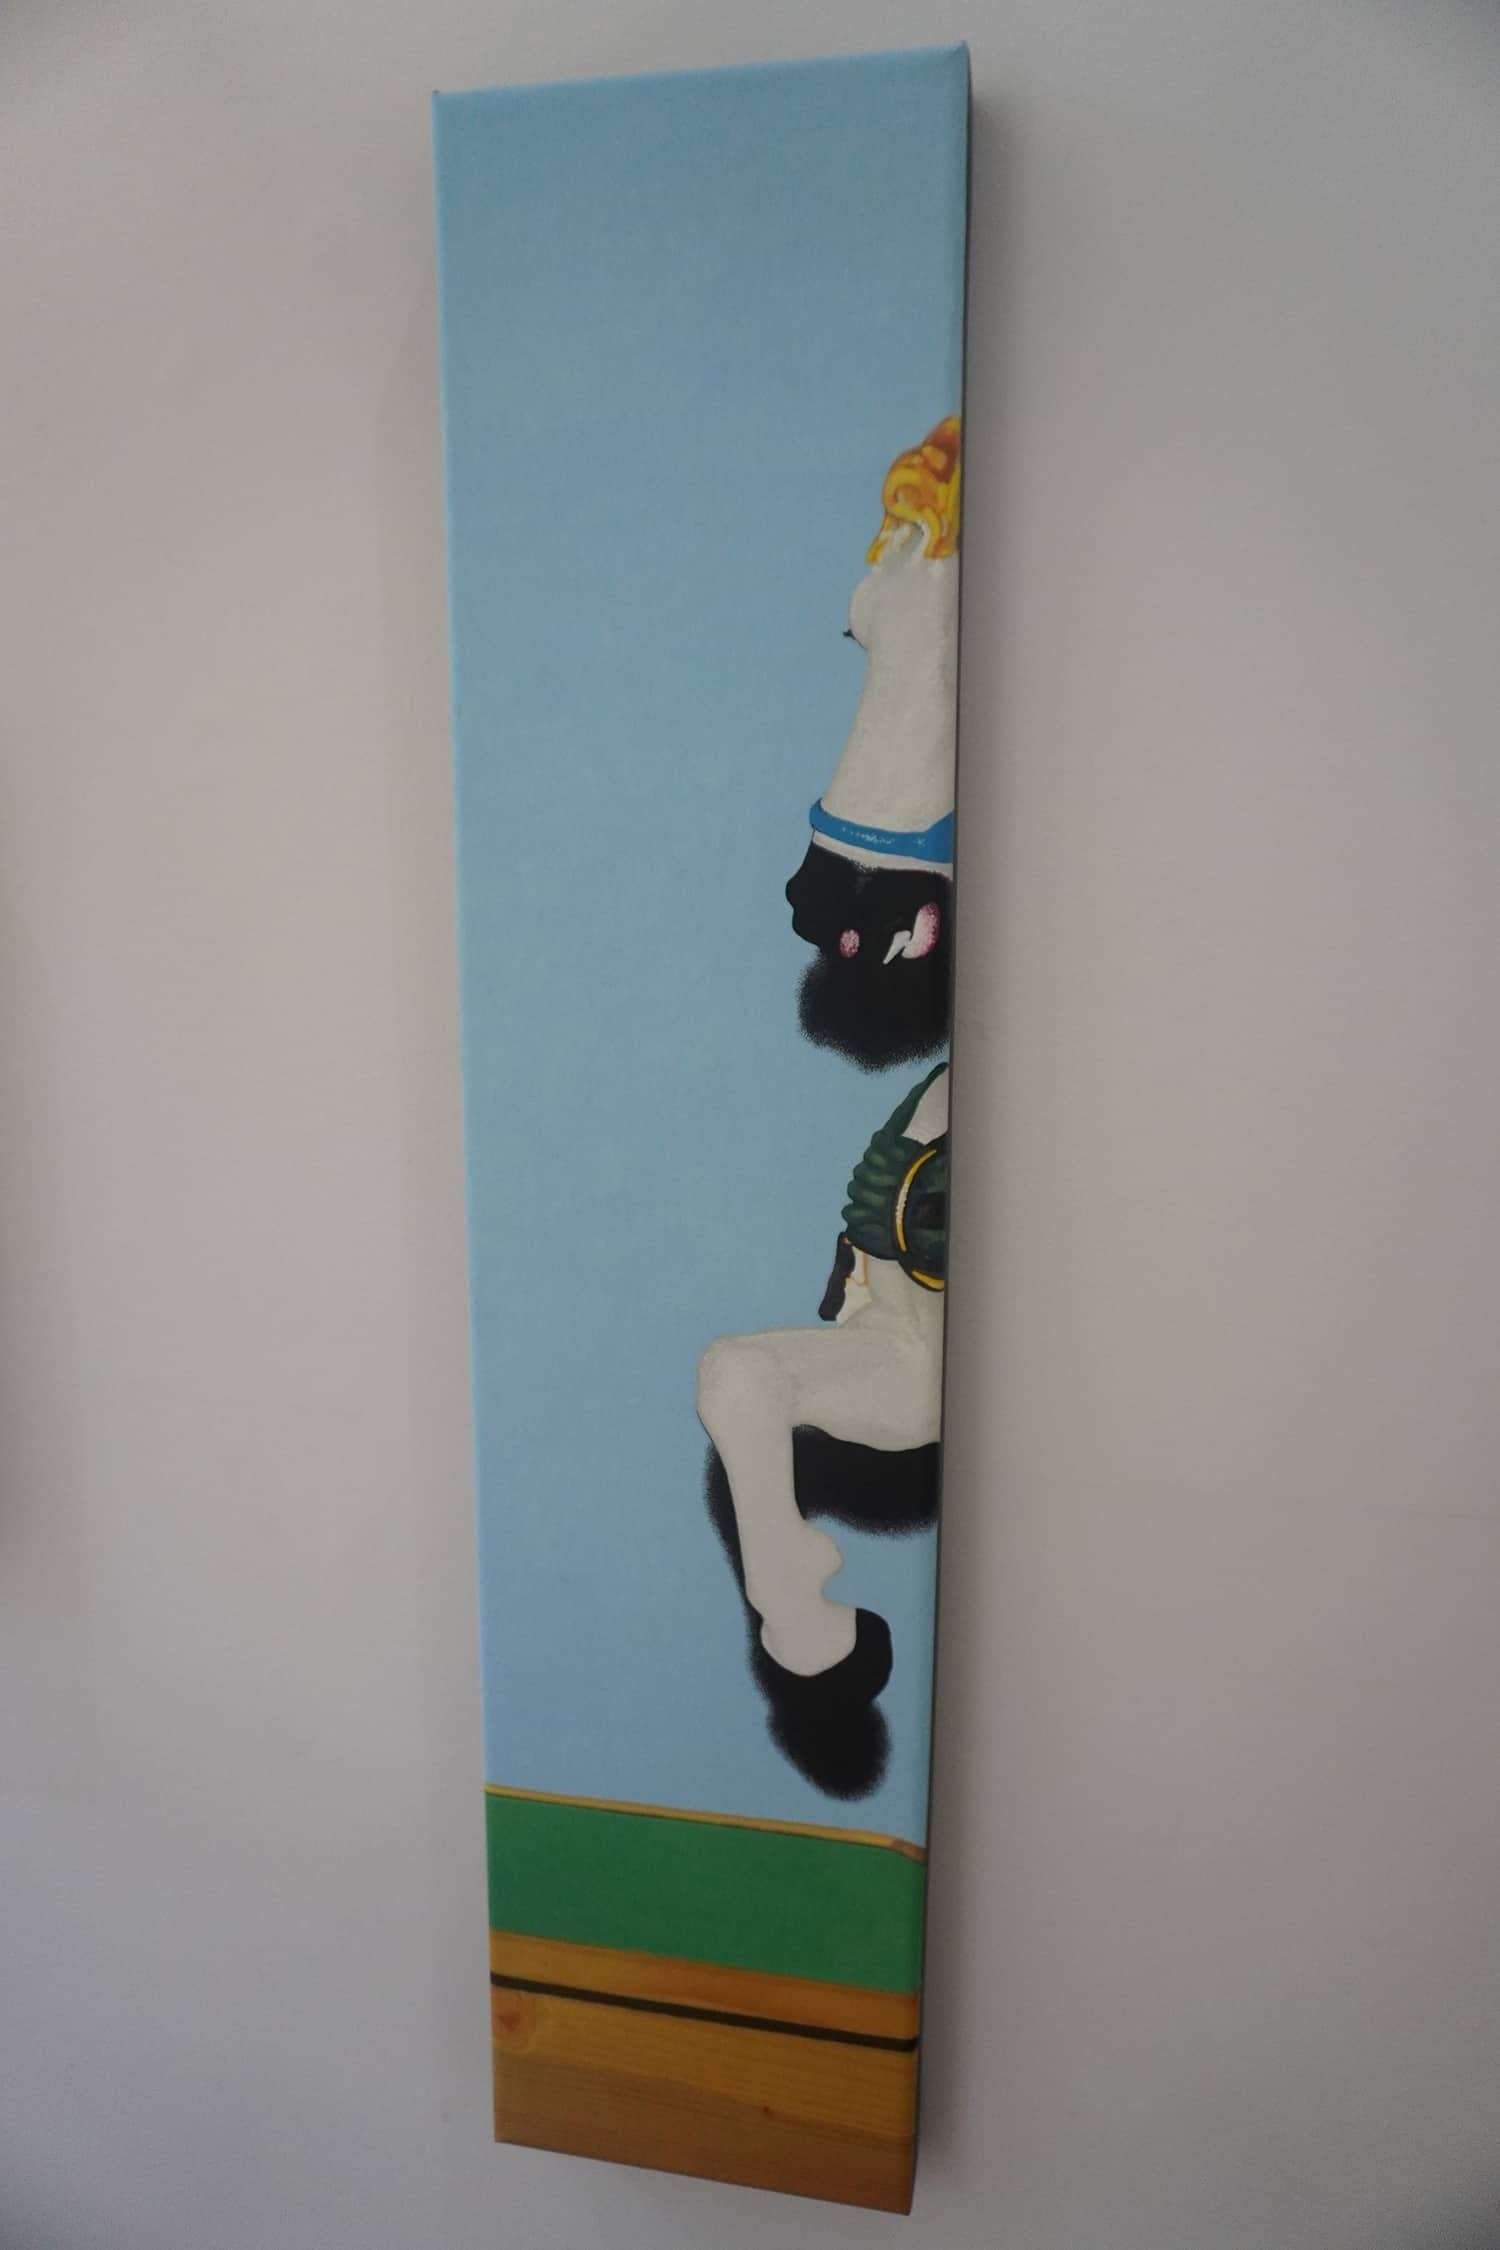 Canteen Gallery Chippendale Sydney Art Out Live December 2020 Spinefoot Kaspar Kagi (4)